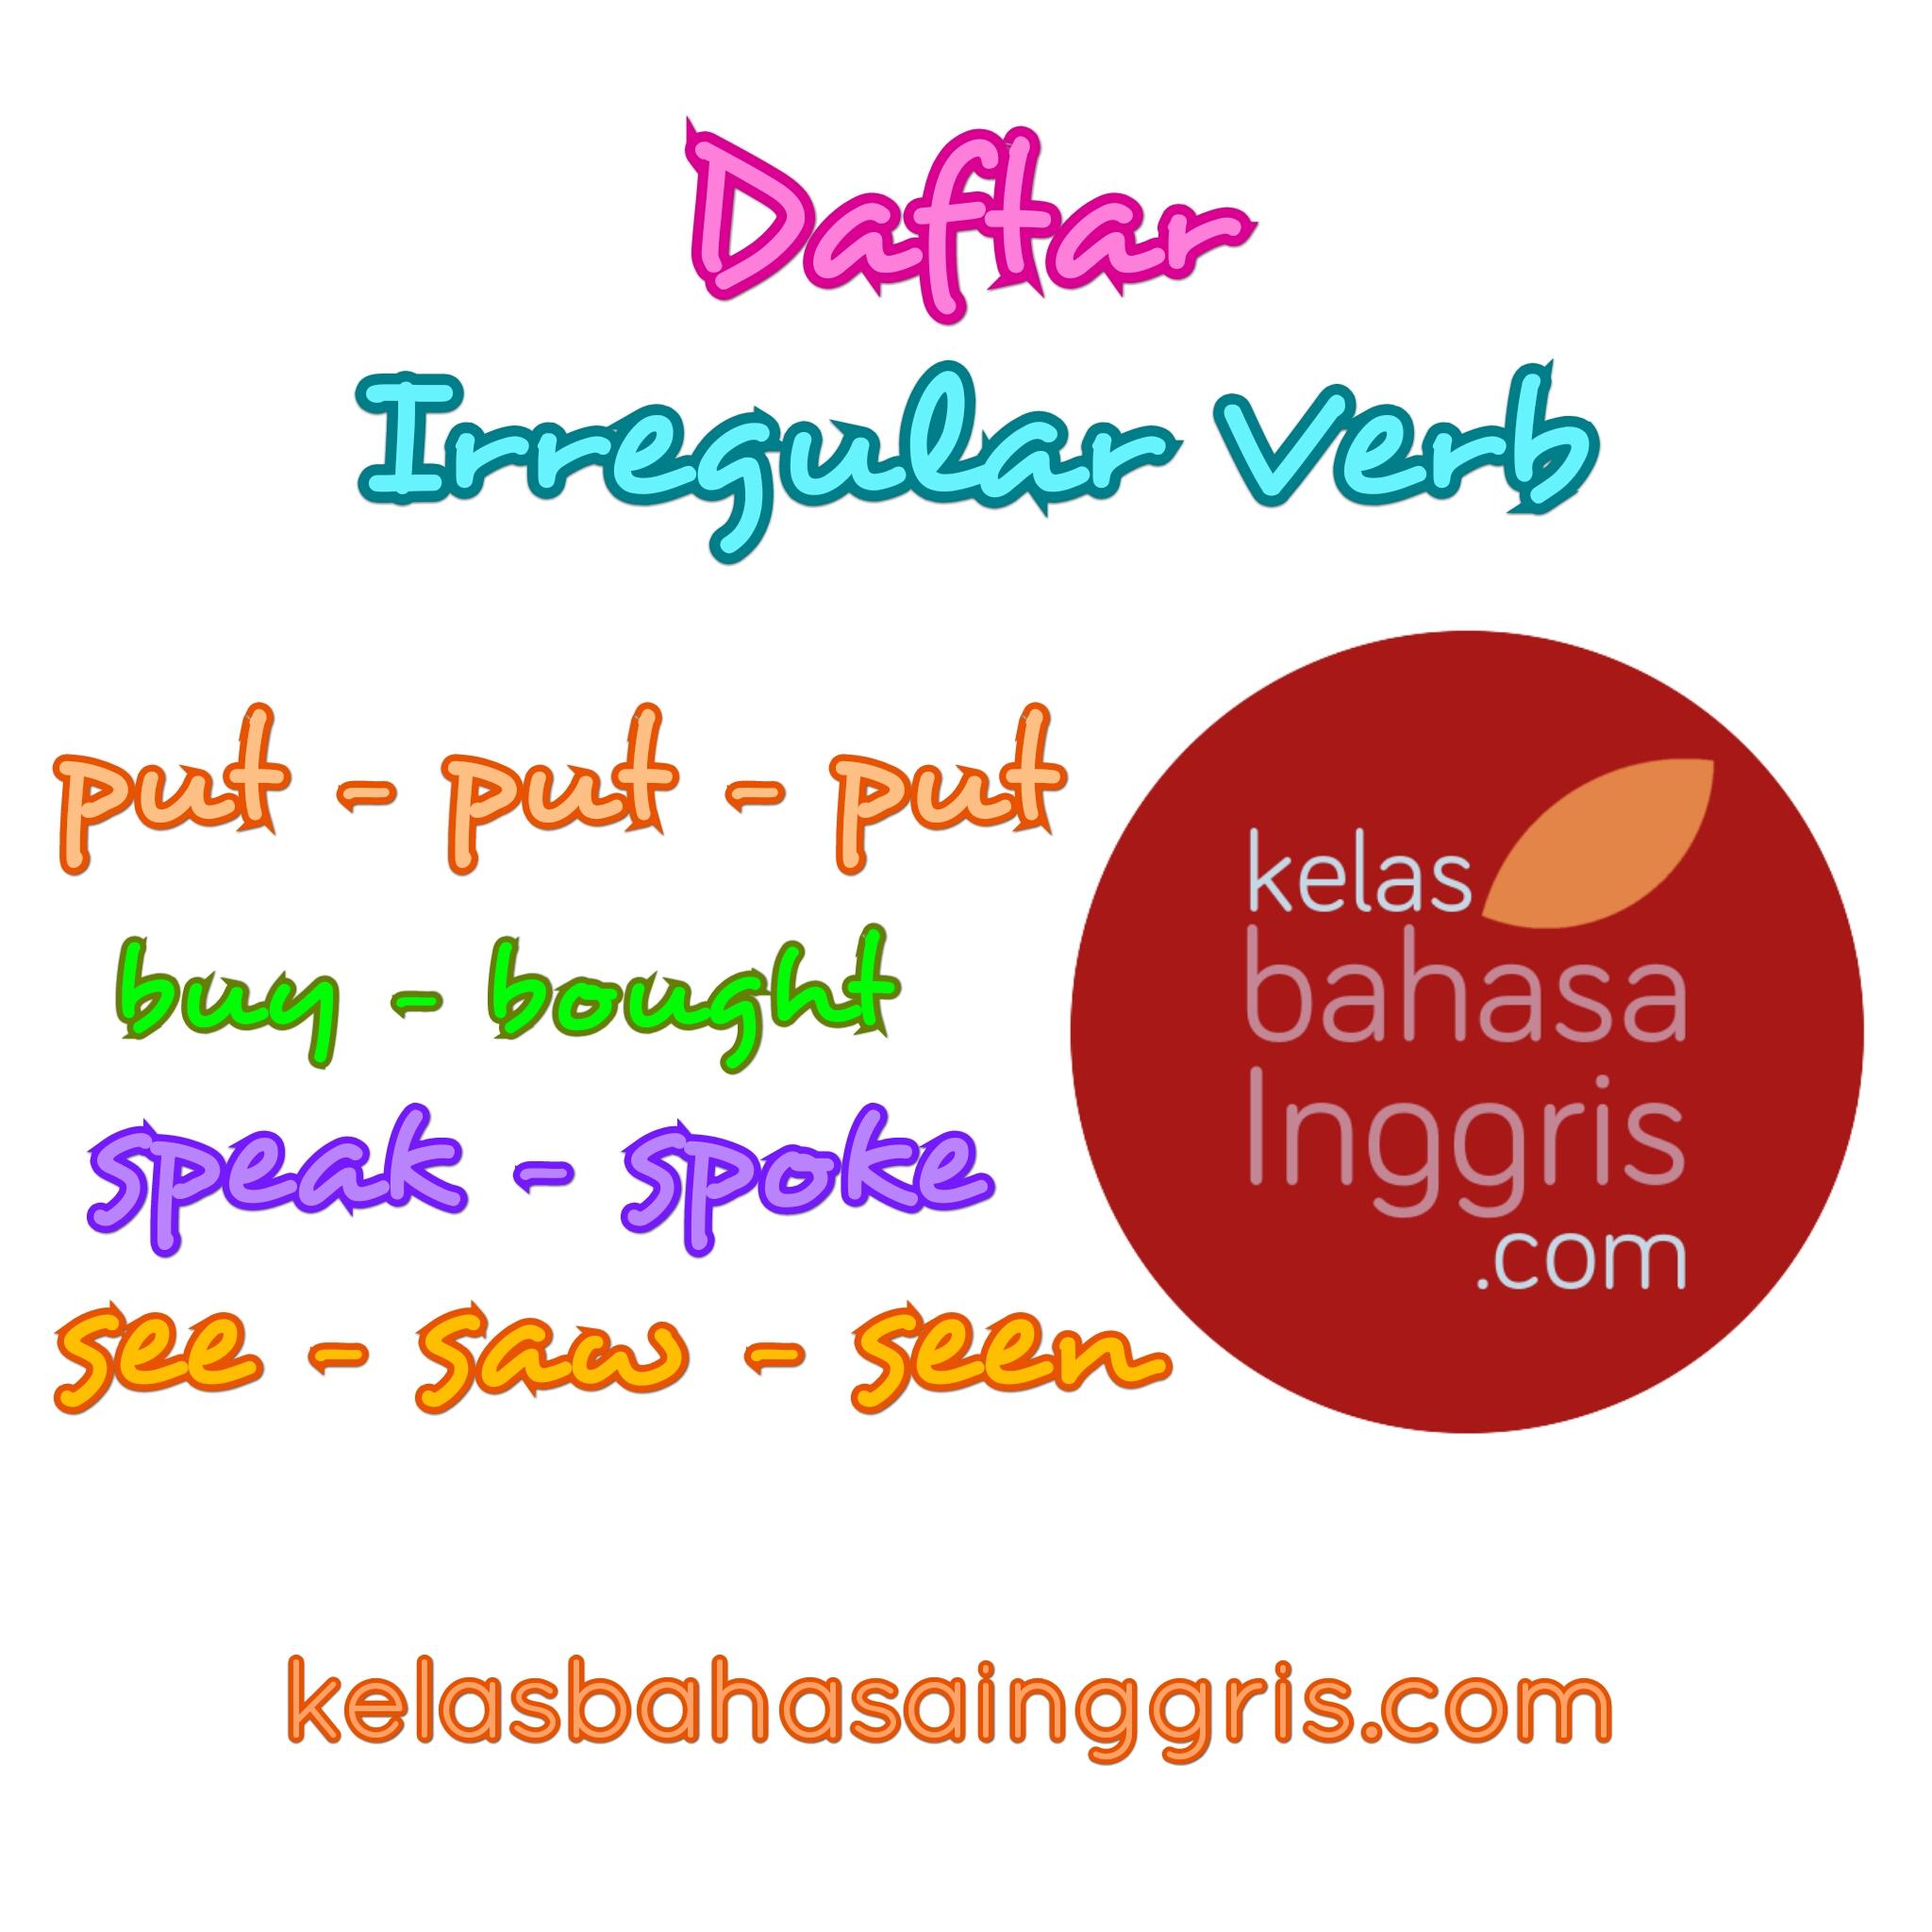 Daftar Lengkap Irregular Verb Beserta Artinya Kelasbahasainggris Com